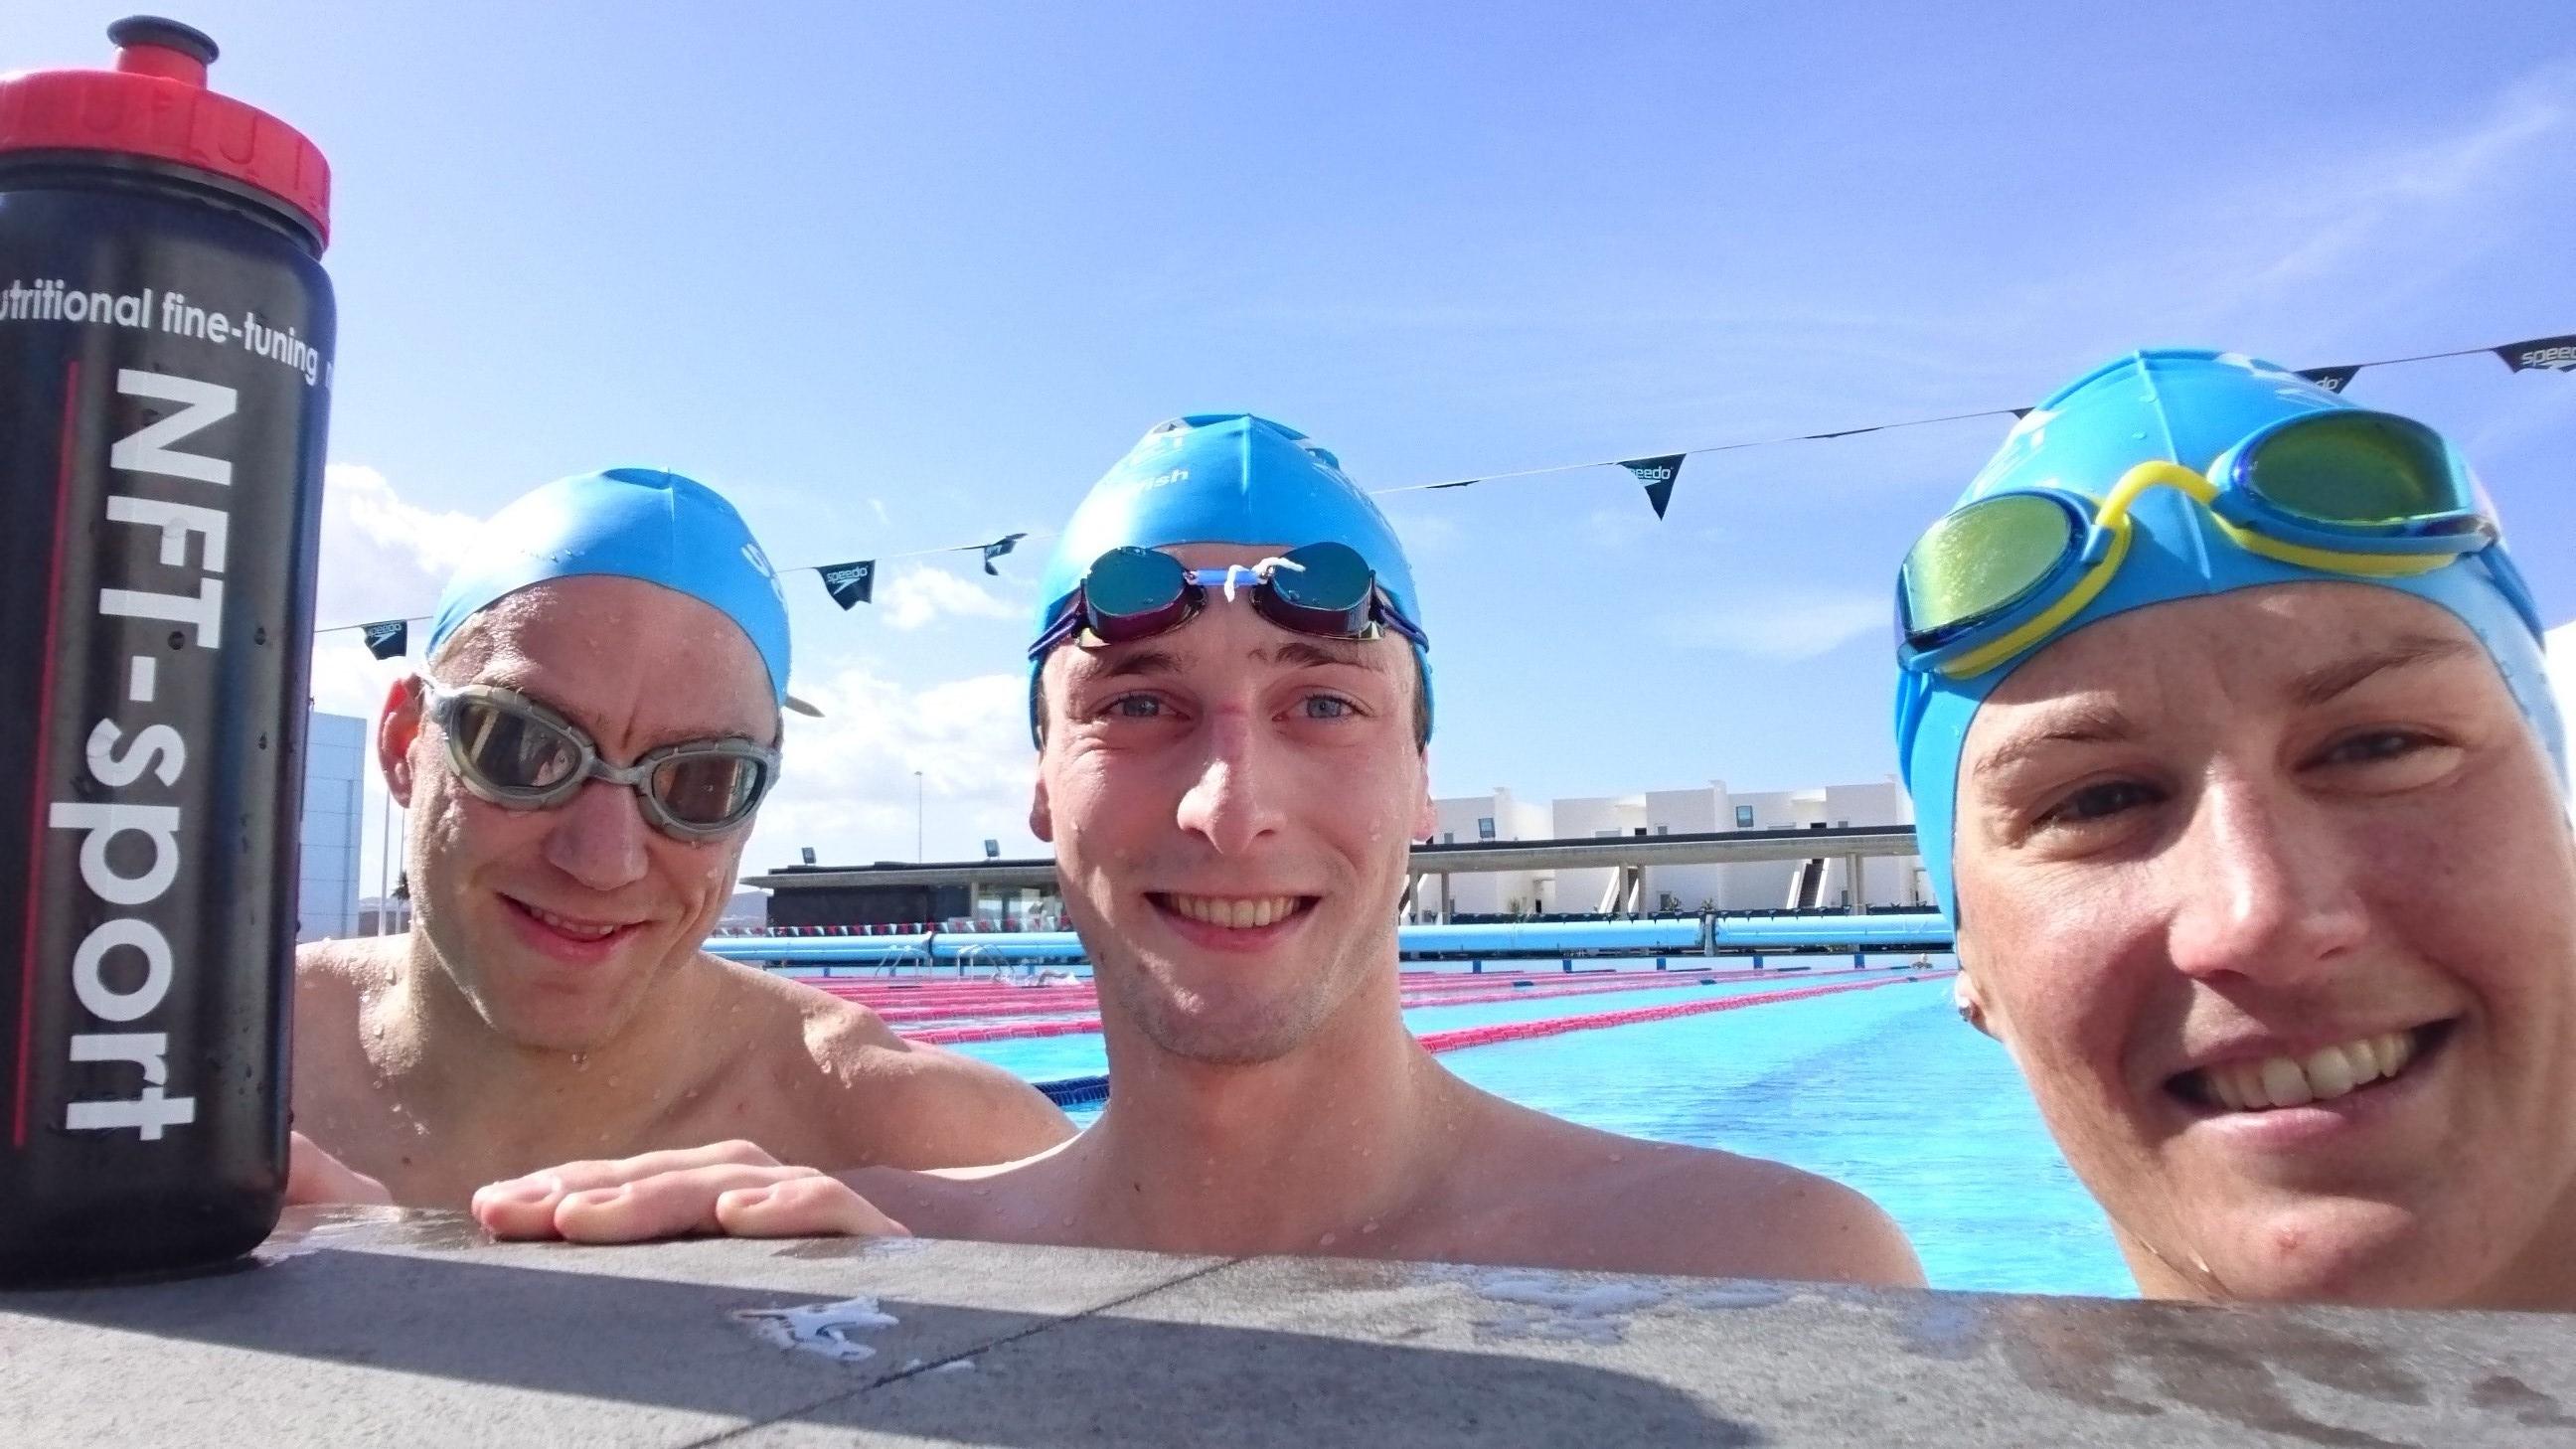 Carolines Athleten: Nils Frommhold, Florian Angert und Julia Gaier